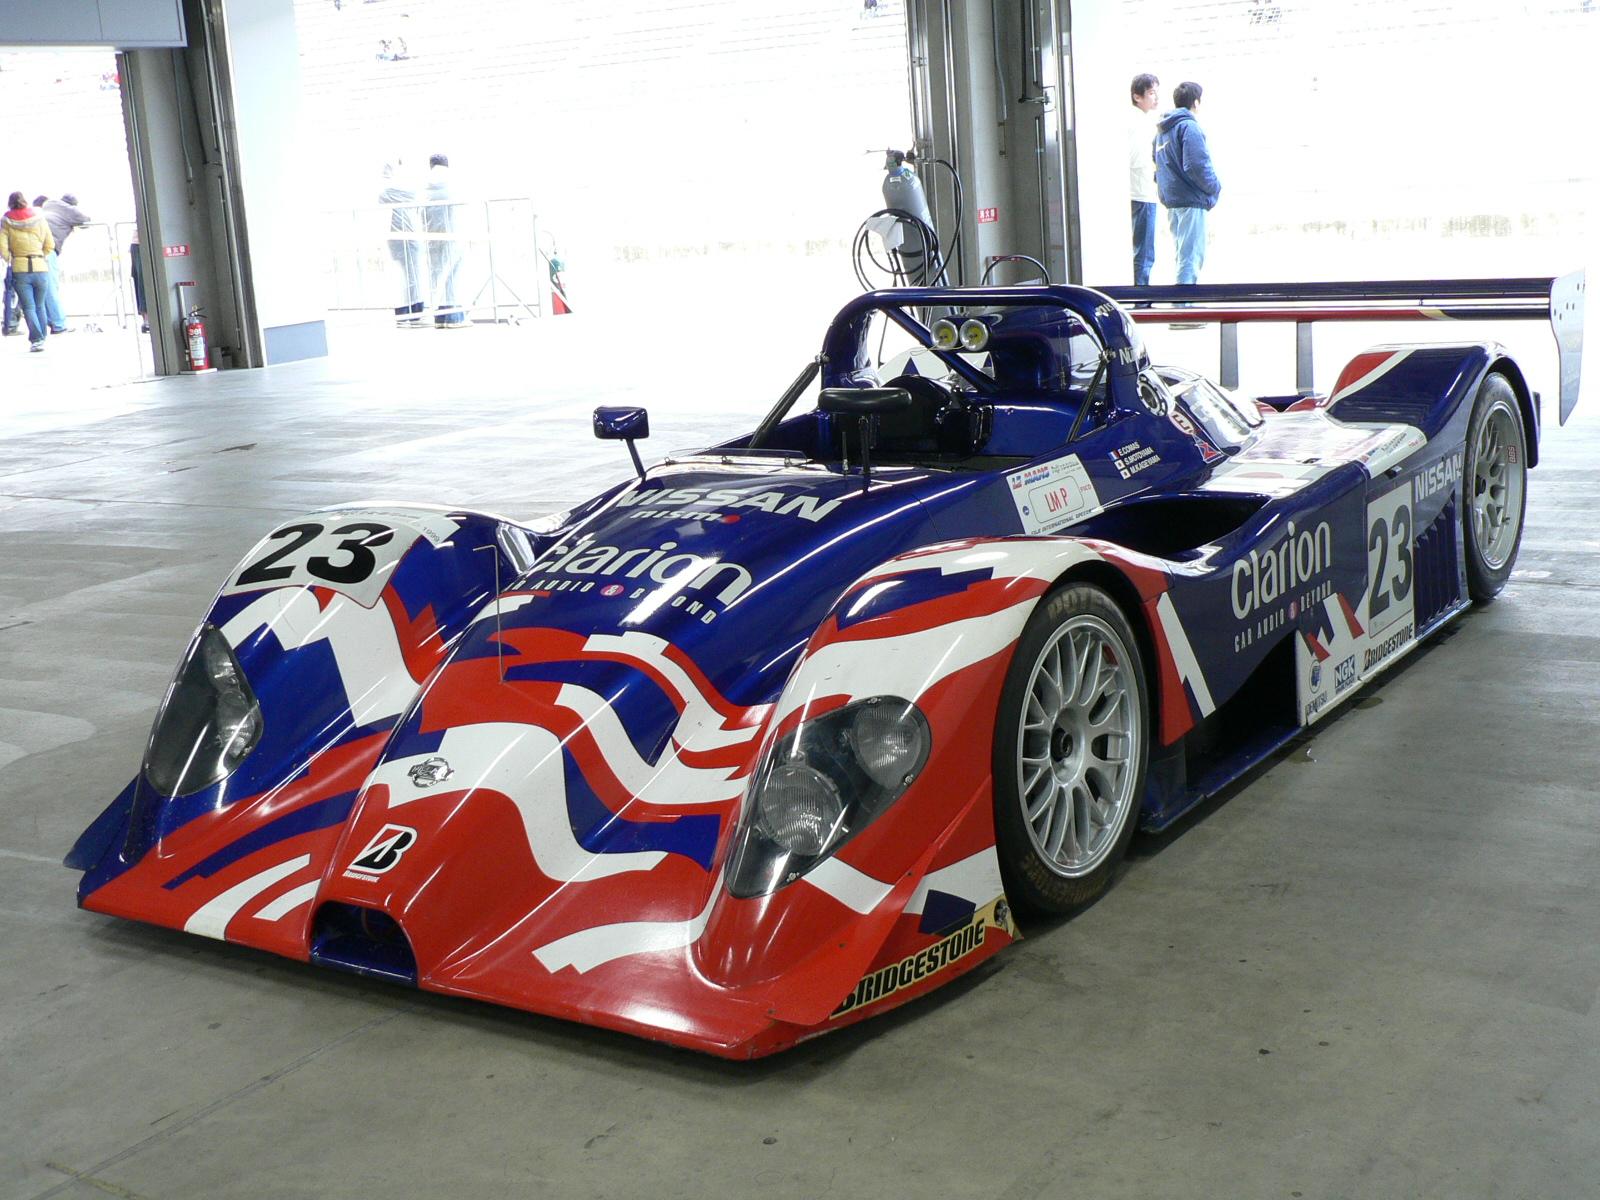 Nissan R391 Group Lmp 1999 Racing Cars